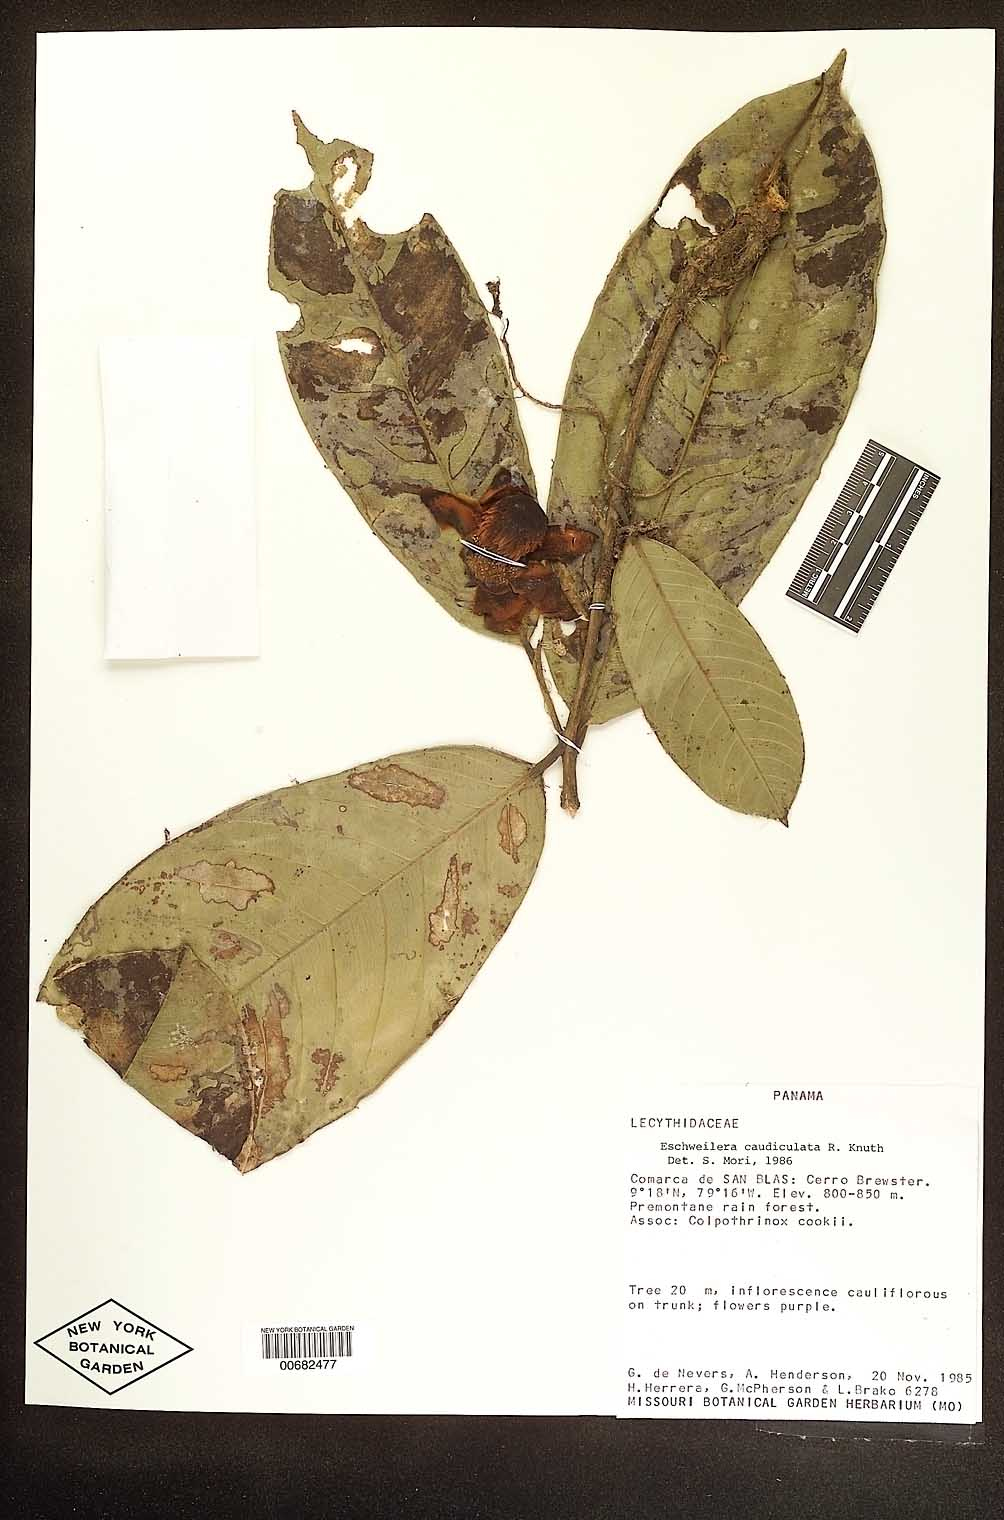 Eschweilera caudiculata image